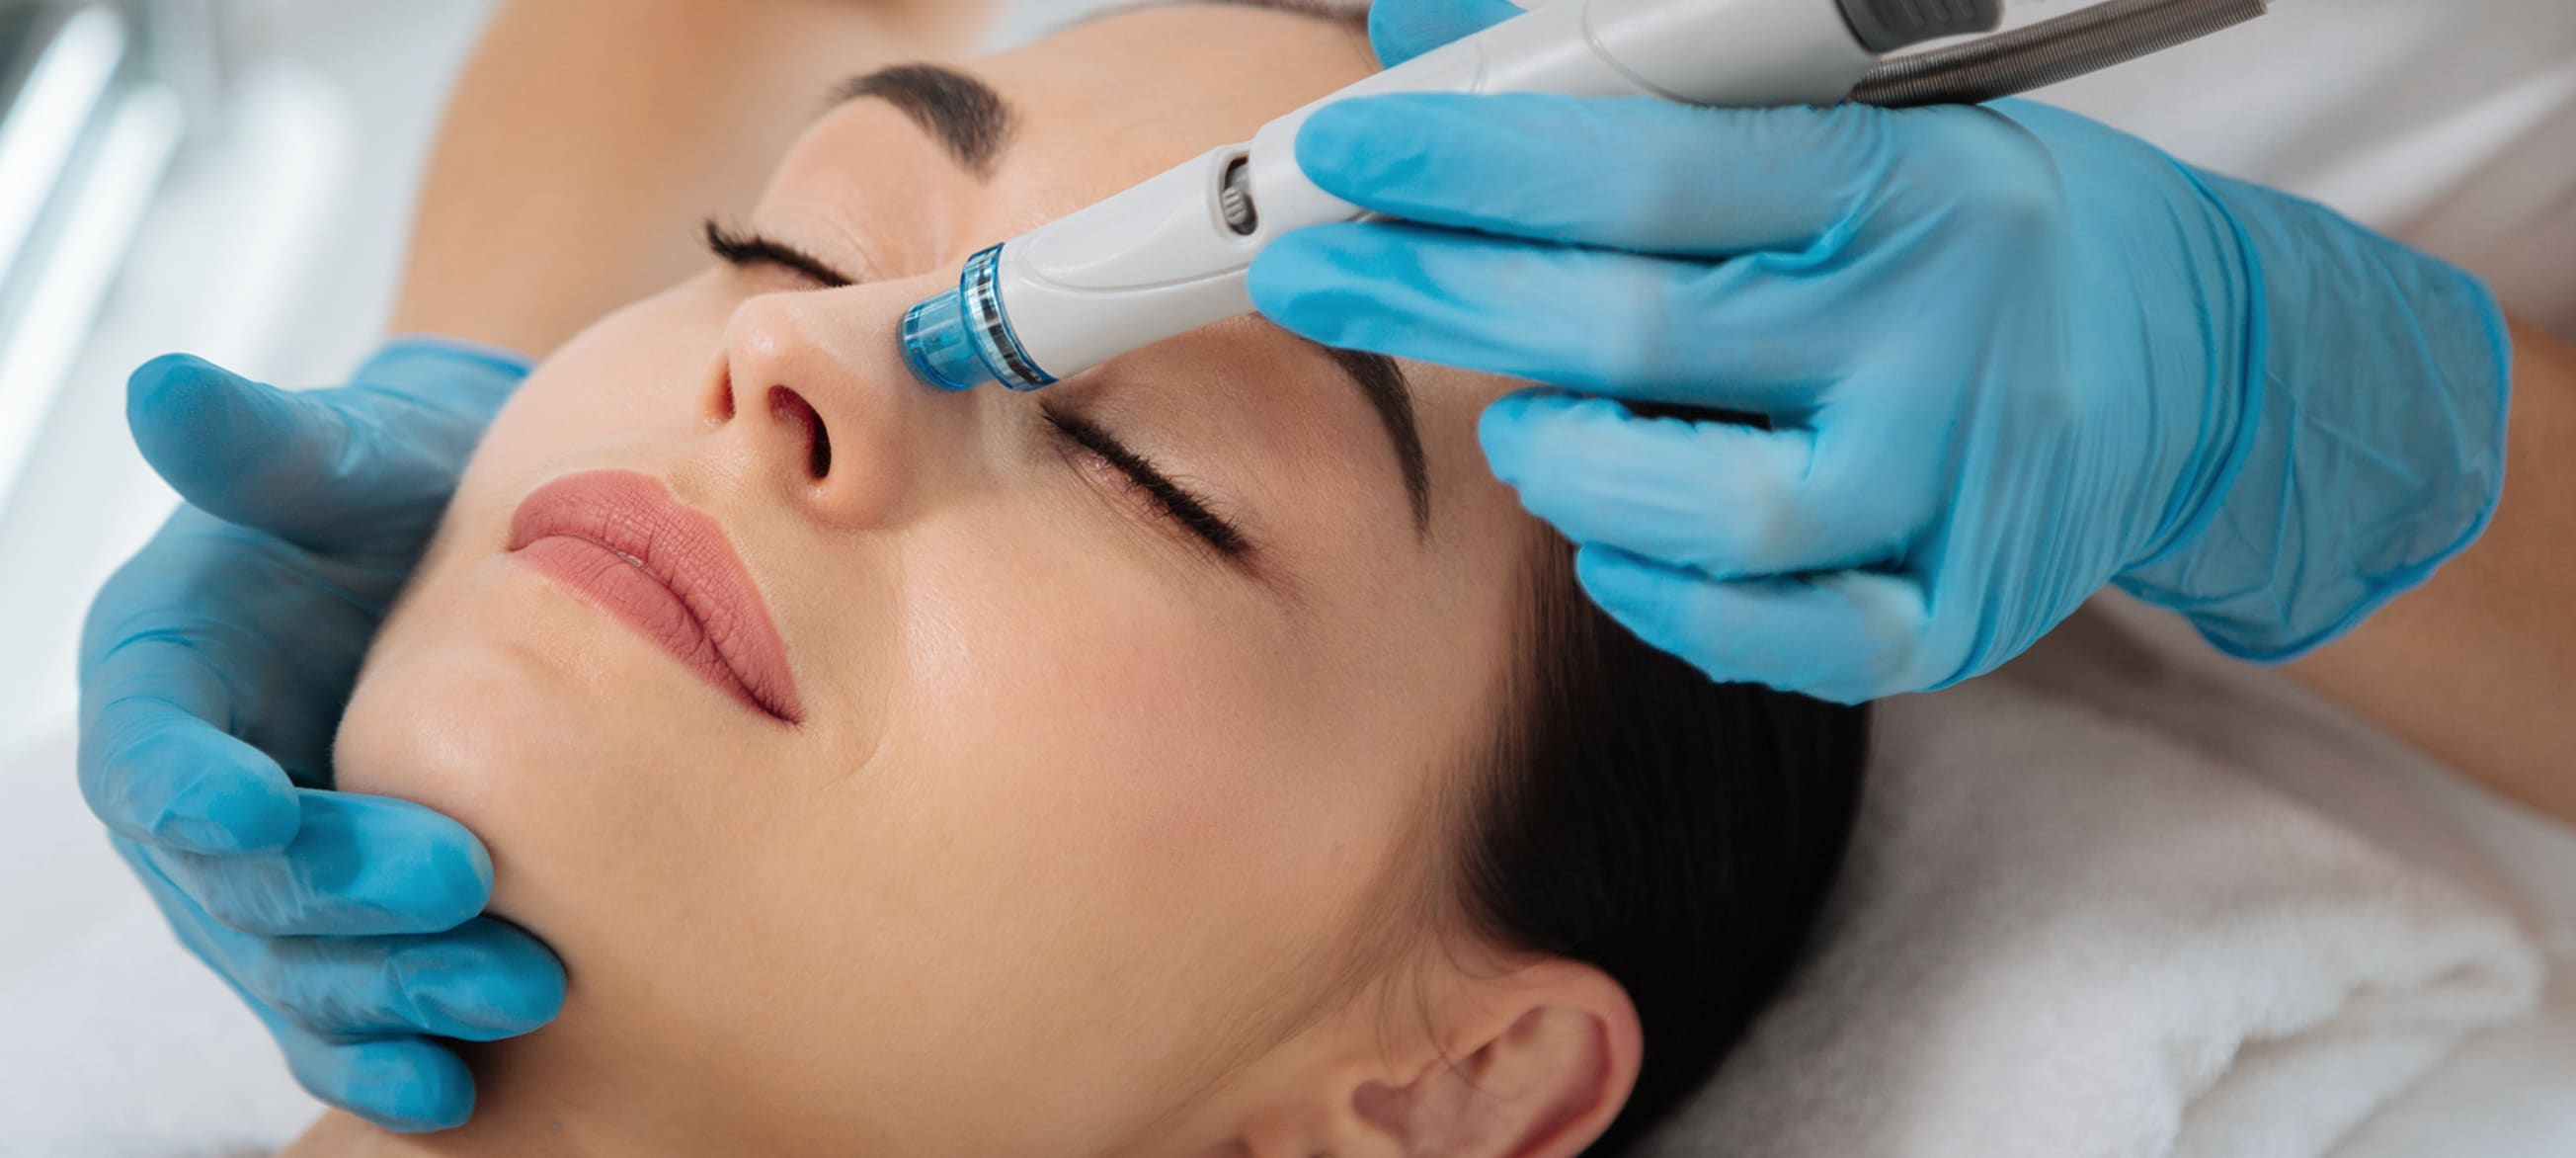 Woman receiving a HydraFacial treatment